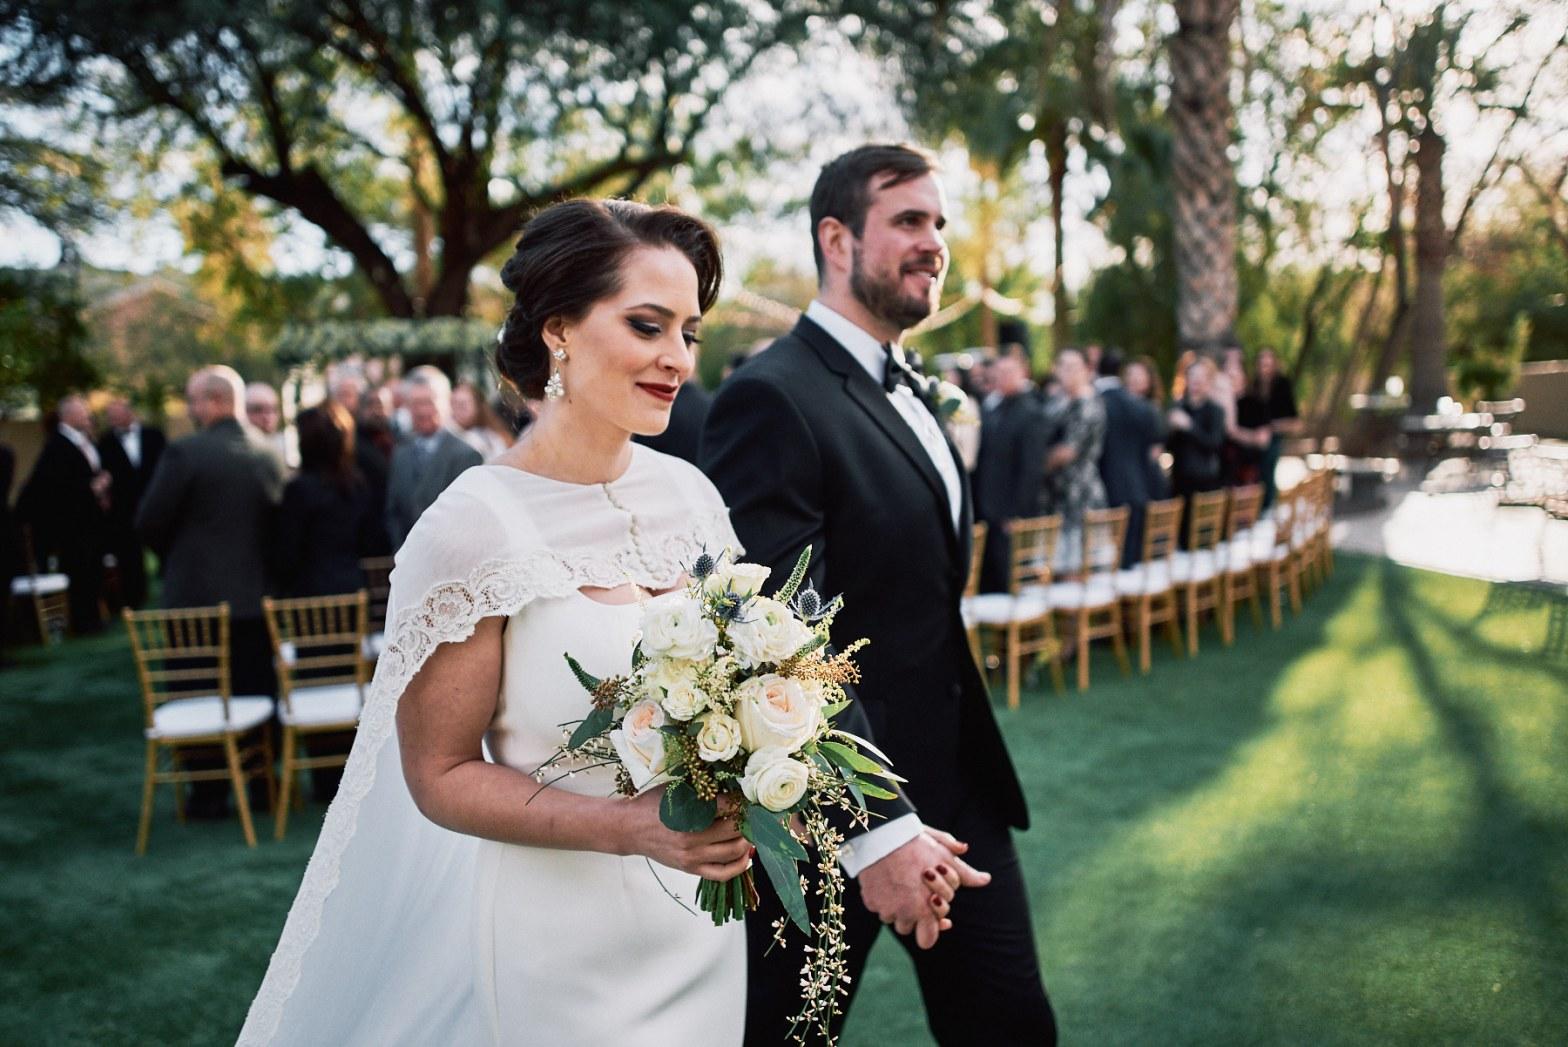 Secret Garden Event Center wedding ceremony